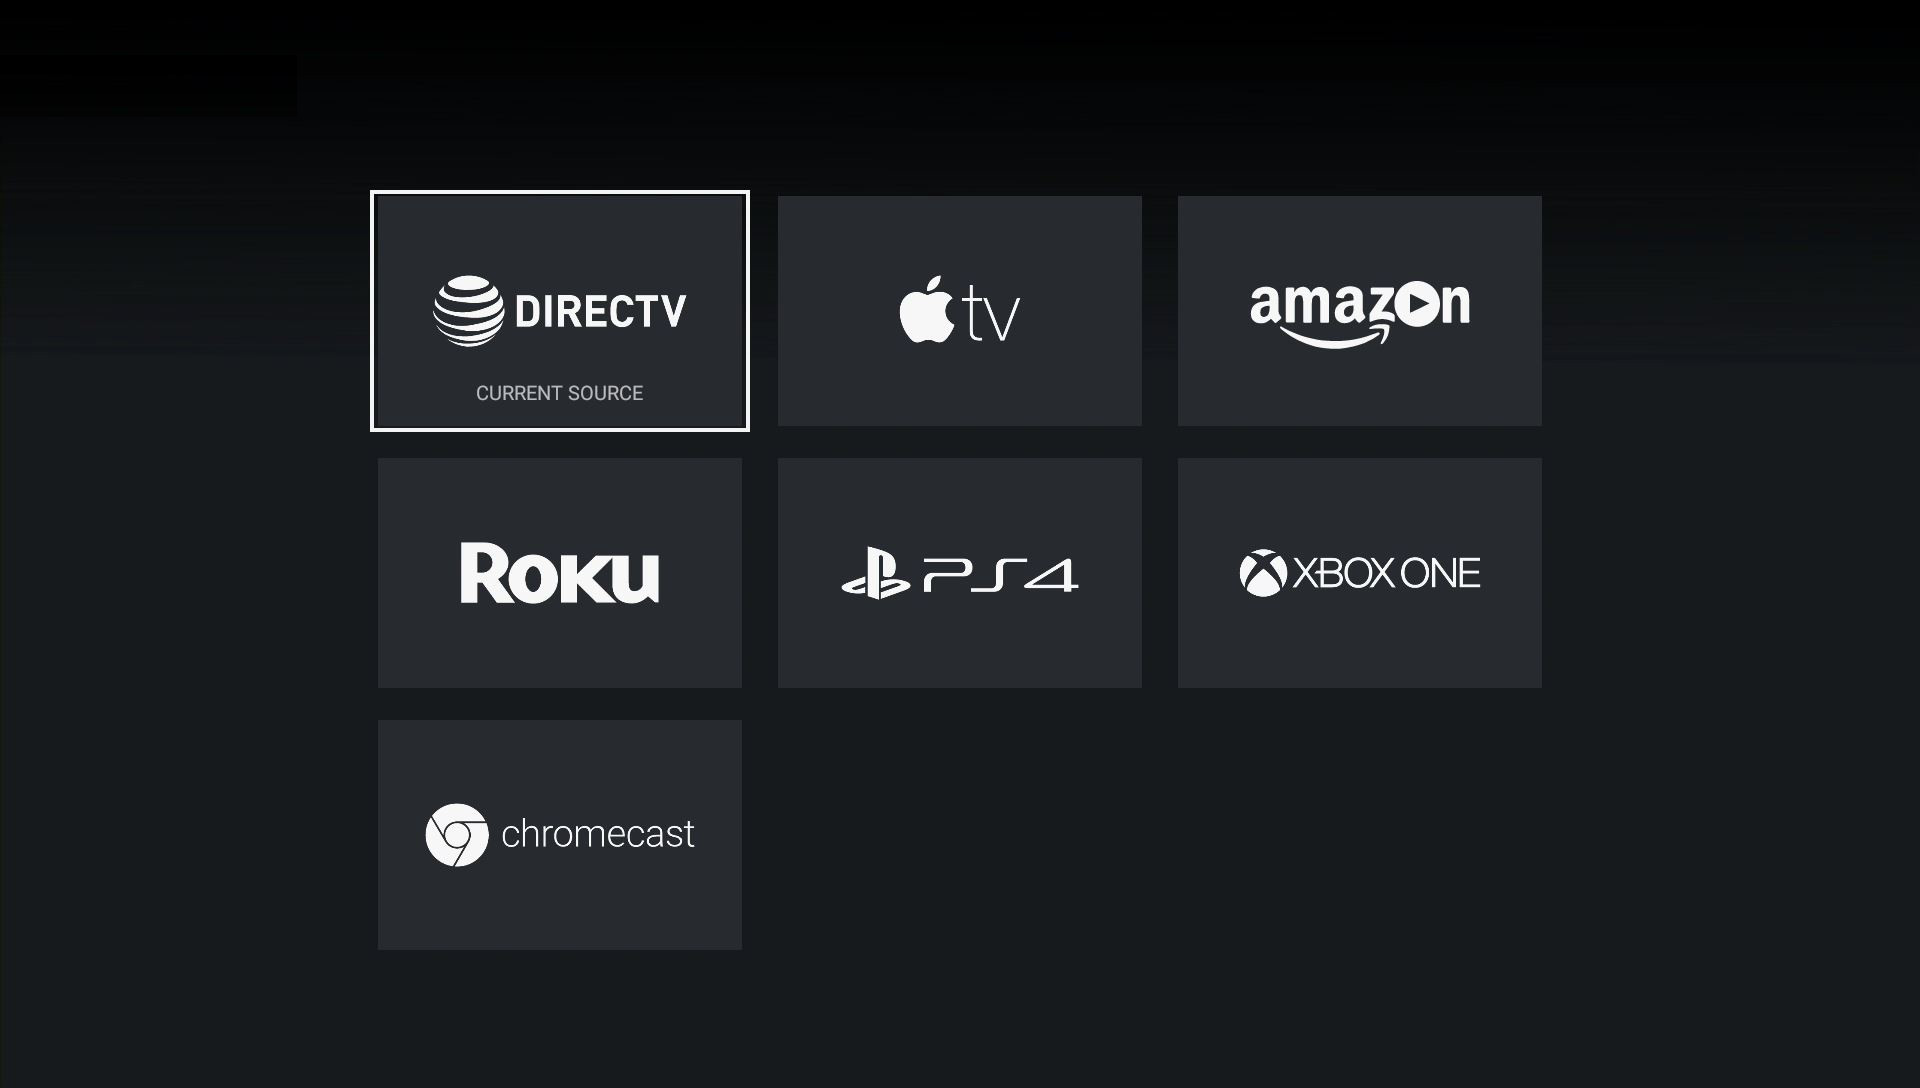 Caavo S 400 Set Top Box Unites Amazon Apple And